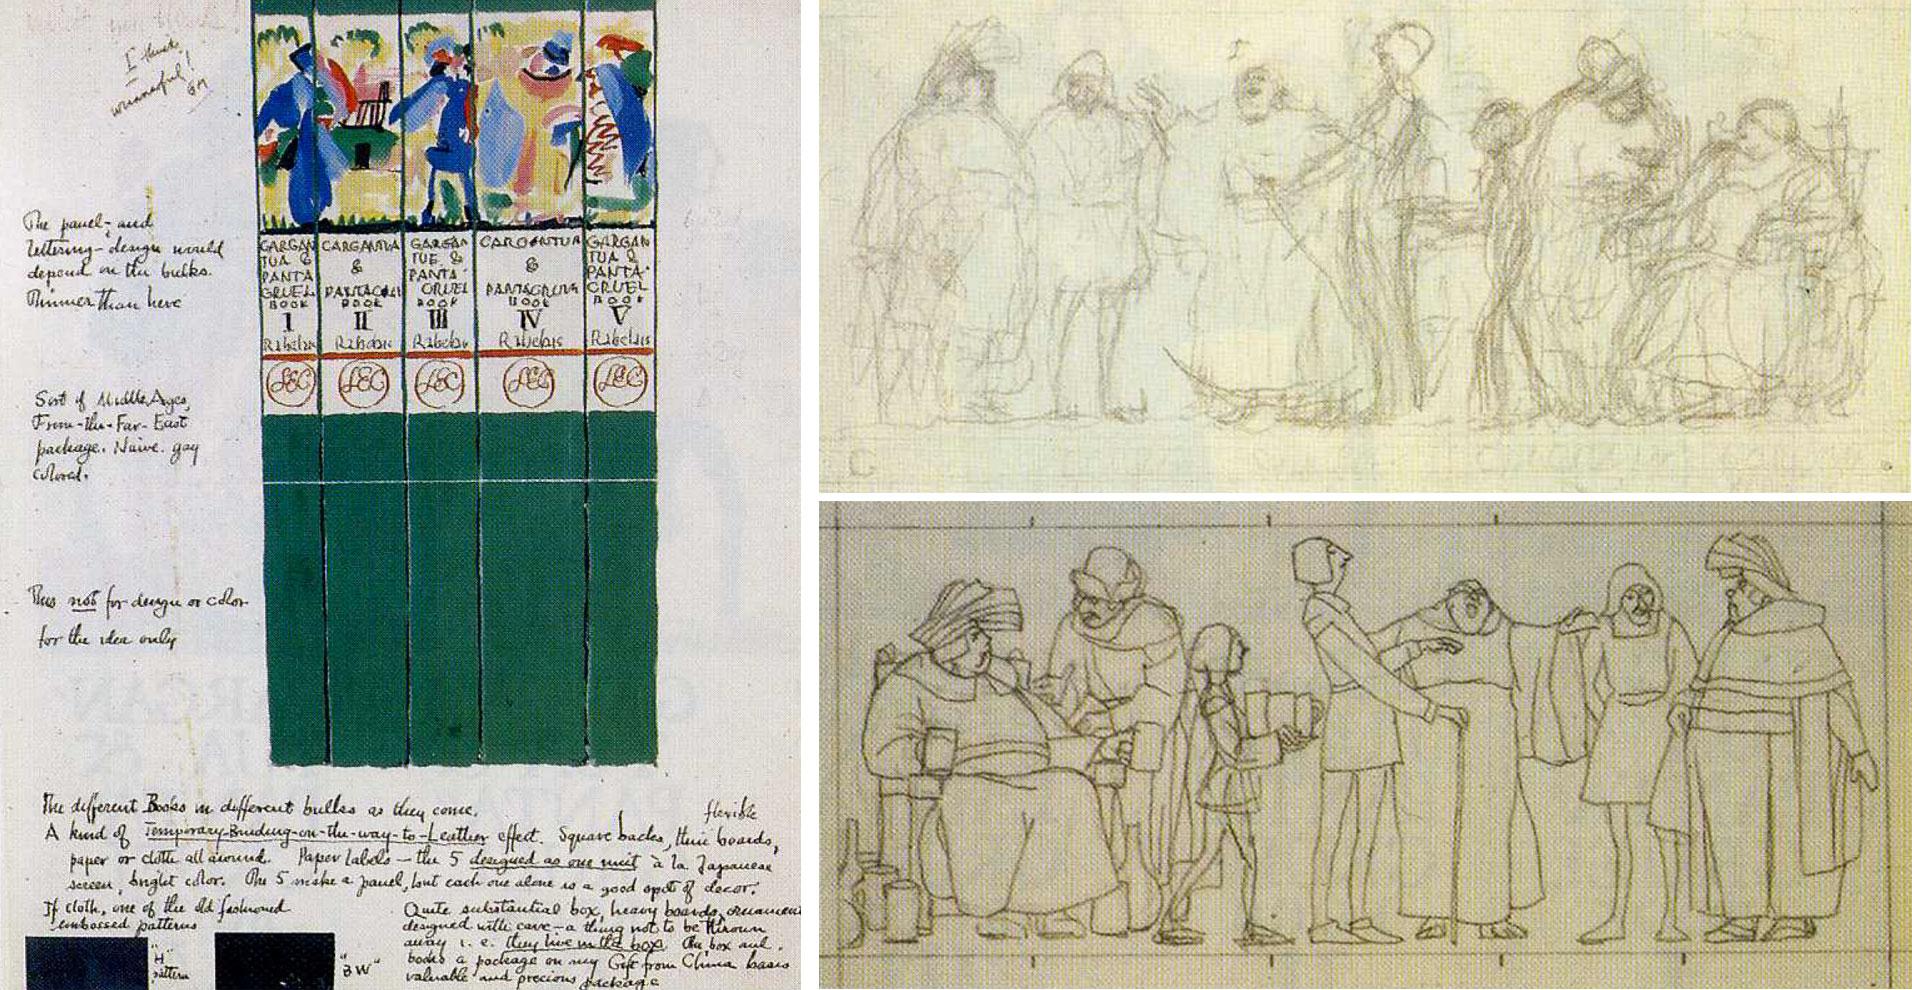 William-Addison-Dwiggins-livres-gargantua-1936-sketch-02